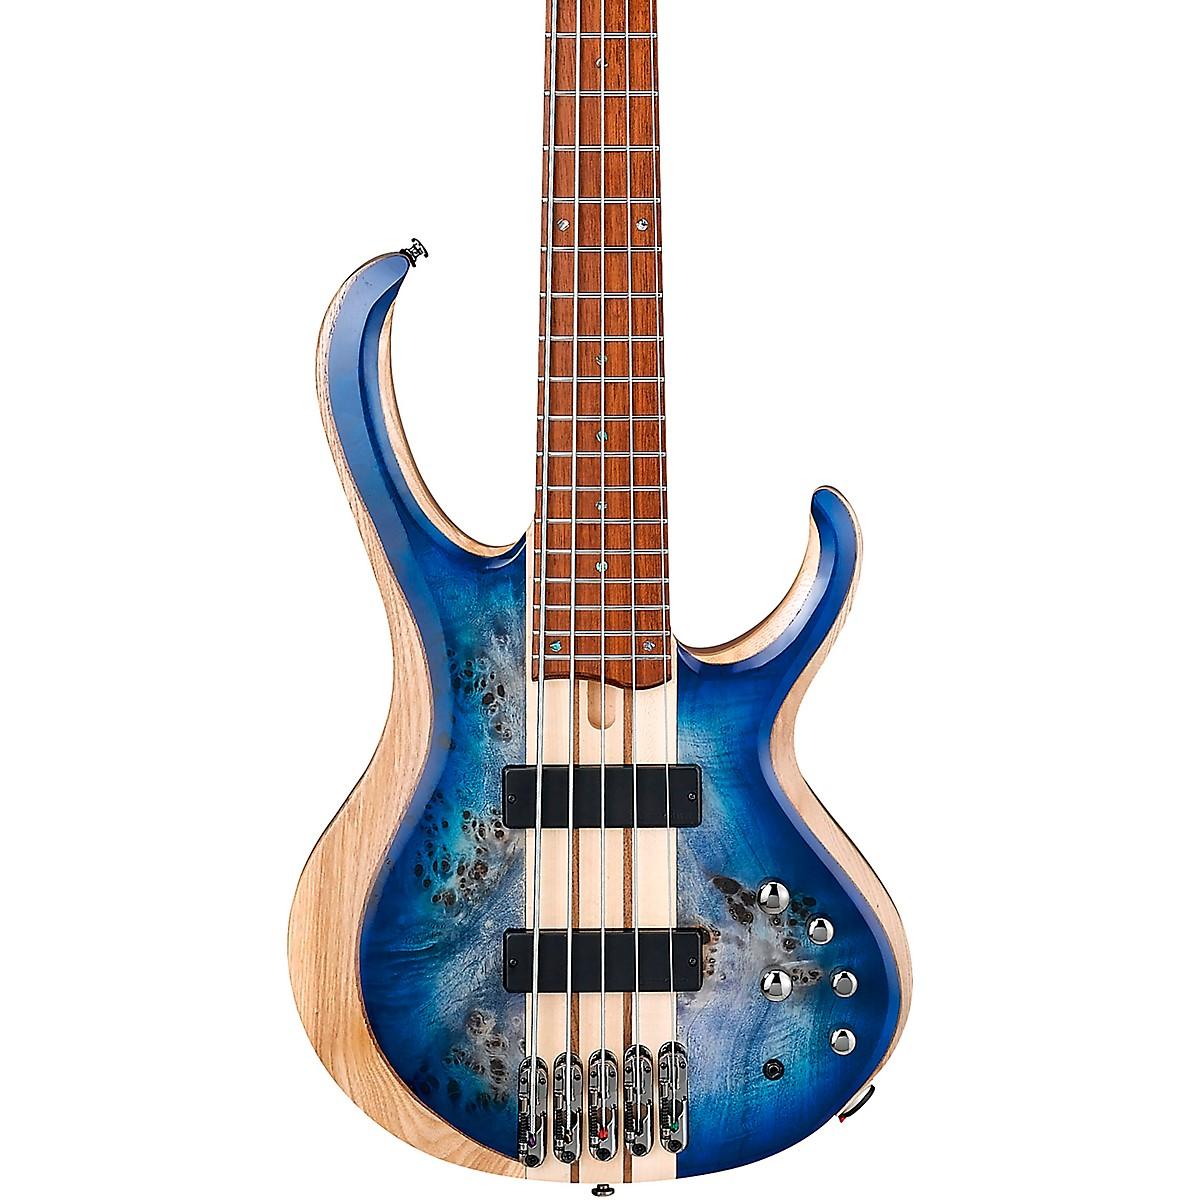 Ibanez BTB845 5-String Electric Bass